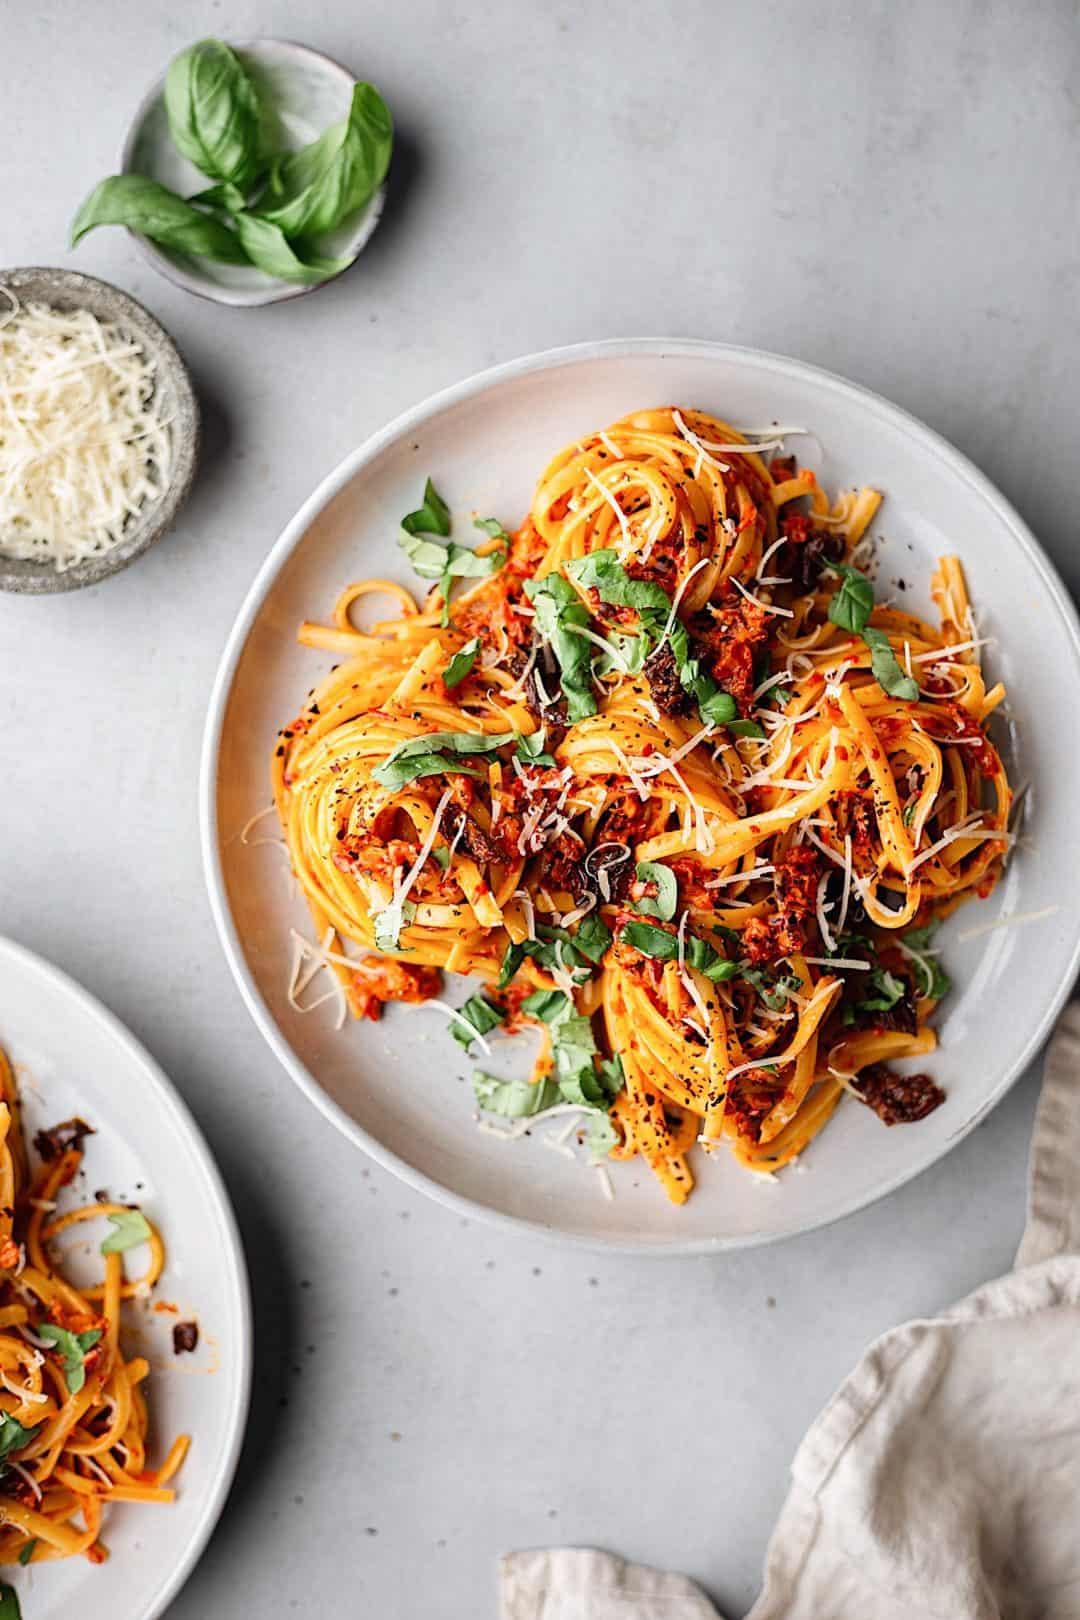 Vegan Roasted Red Pepper Pasta #vegan #recipe #pasta #redpepper